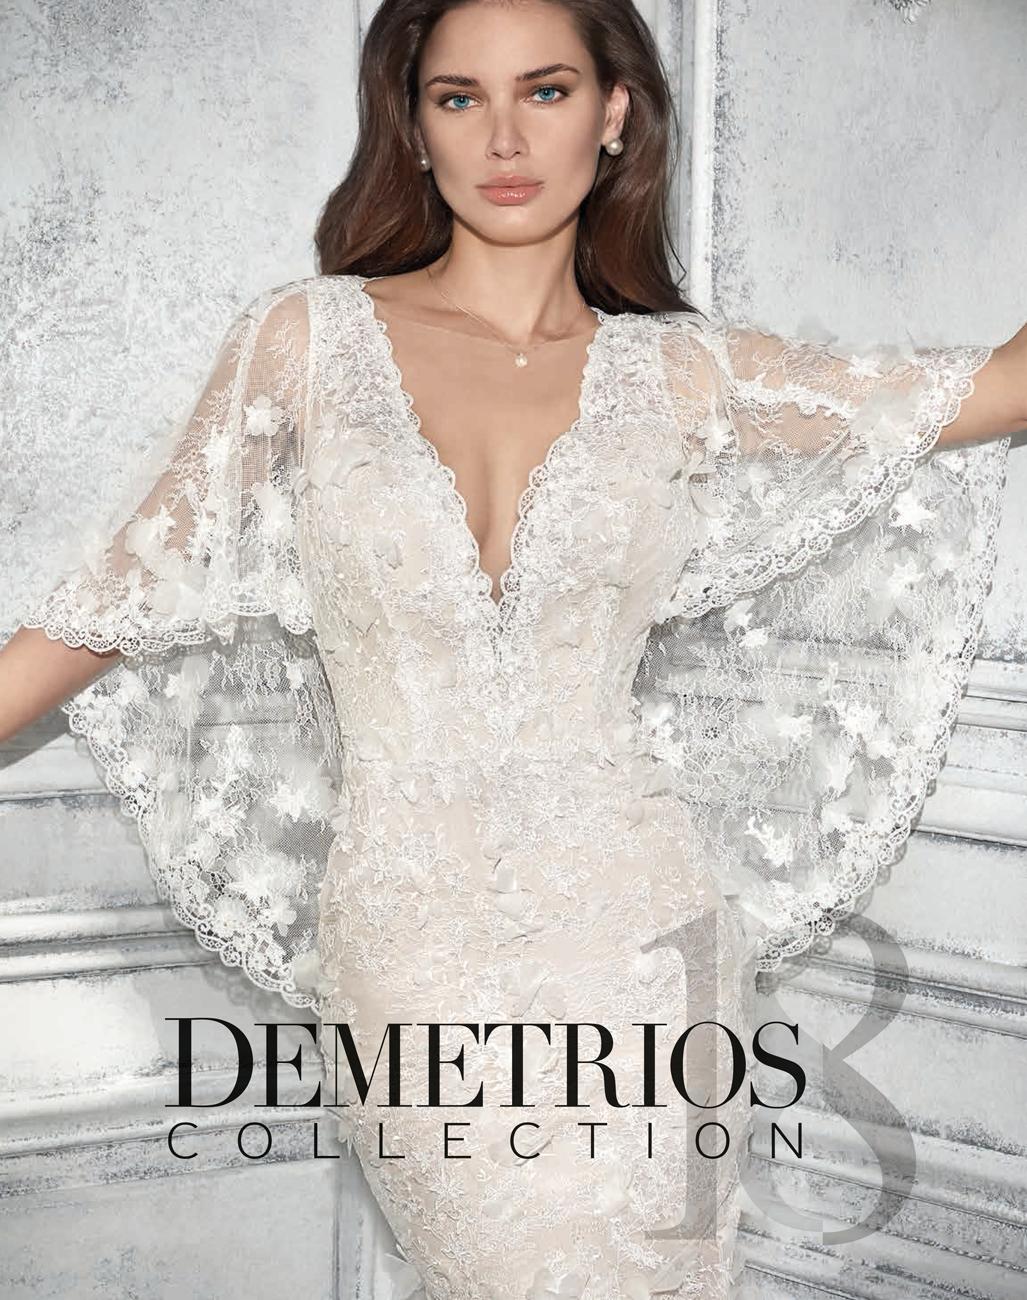 SposaNovias Vigo, Colección de Vestidos de Novia Demetrios 2018